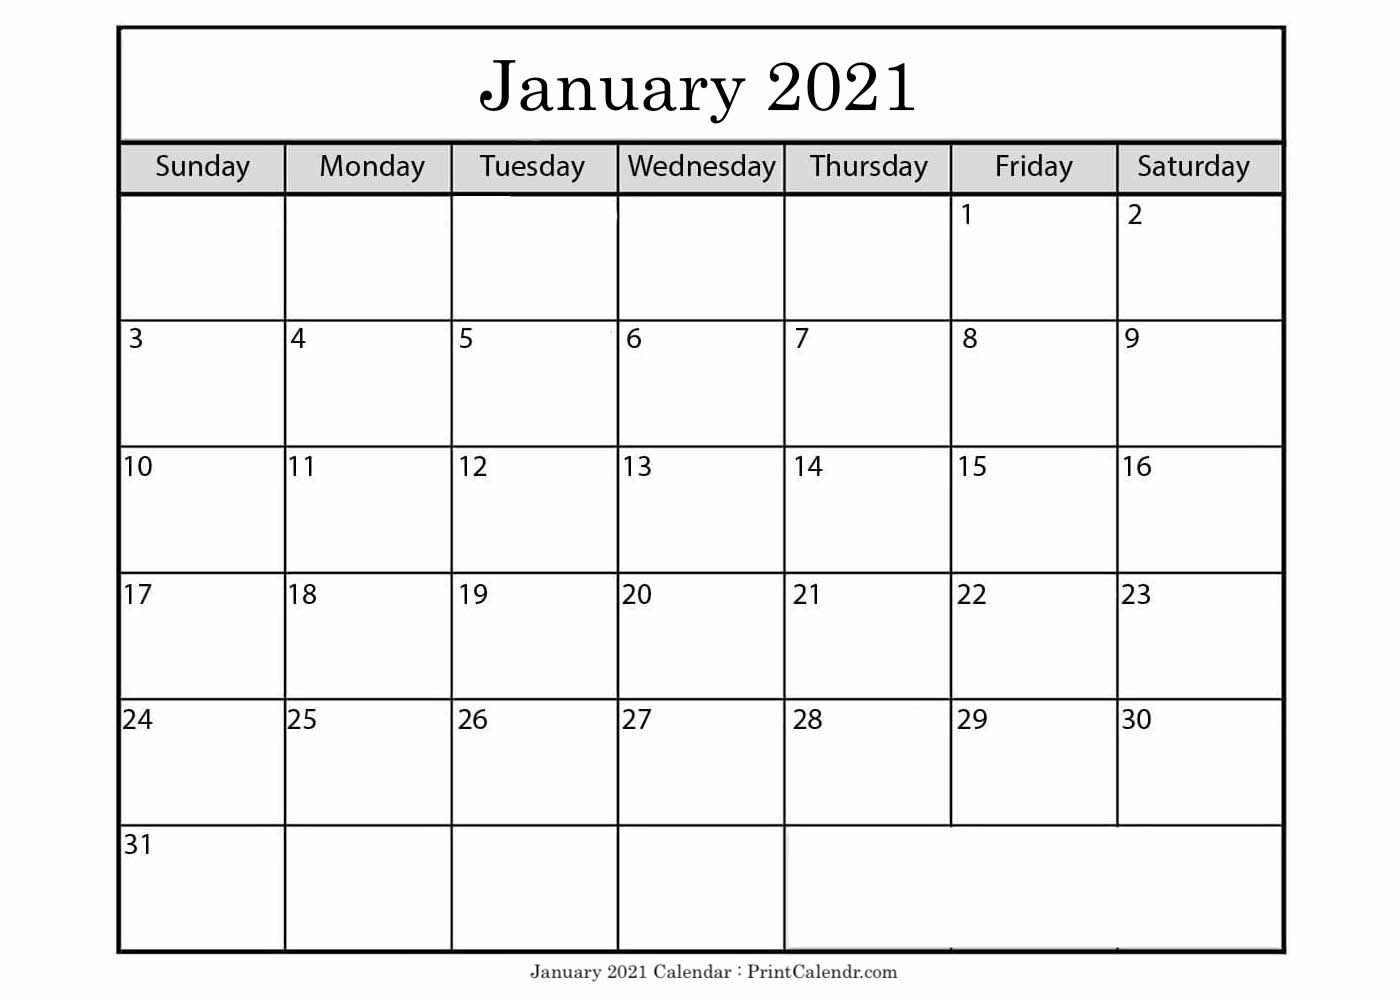 Free January 2021 Calendar Printable - Print Calendar